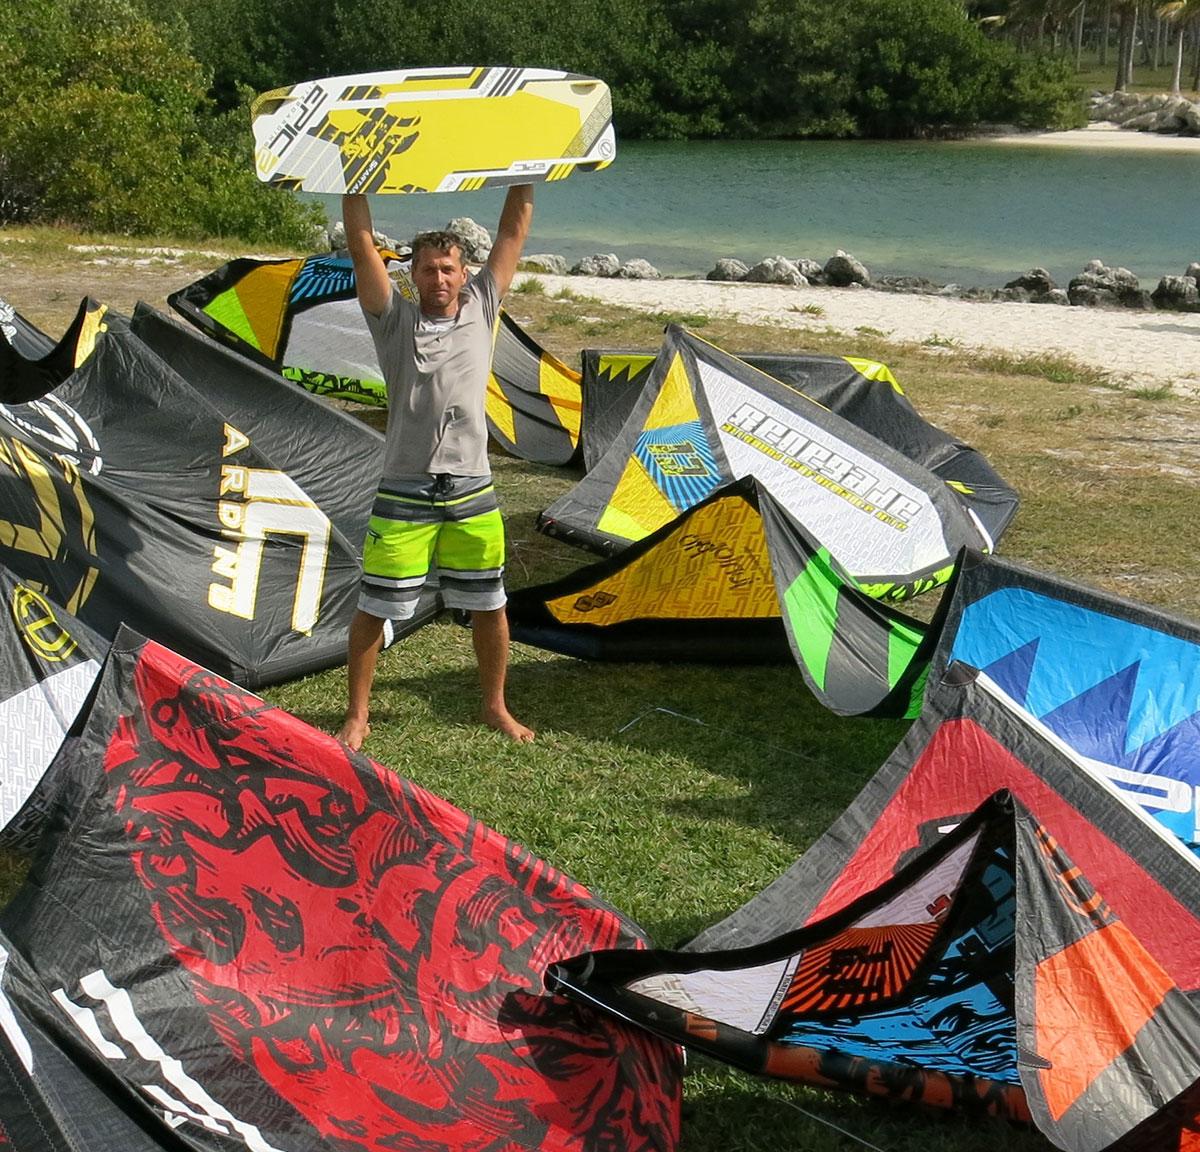 curry hammock state park florida keys epic kites kiteboarding   photos   curry hammock state park      rh   epickiteskiteboarding